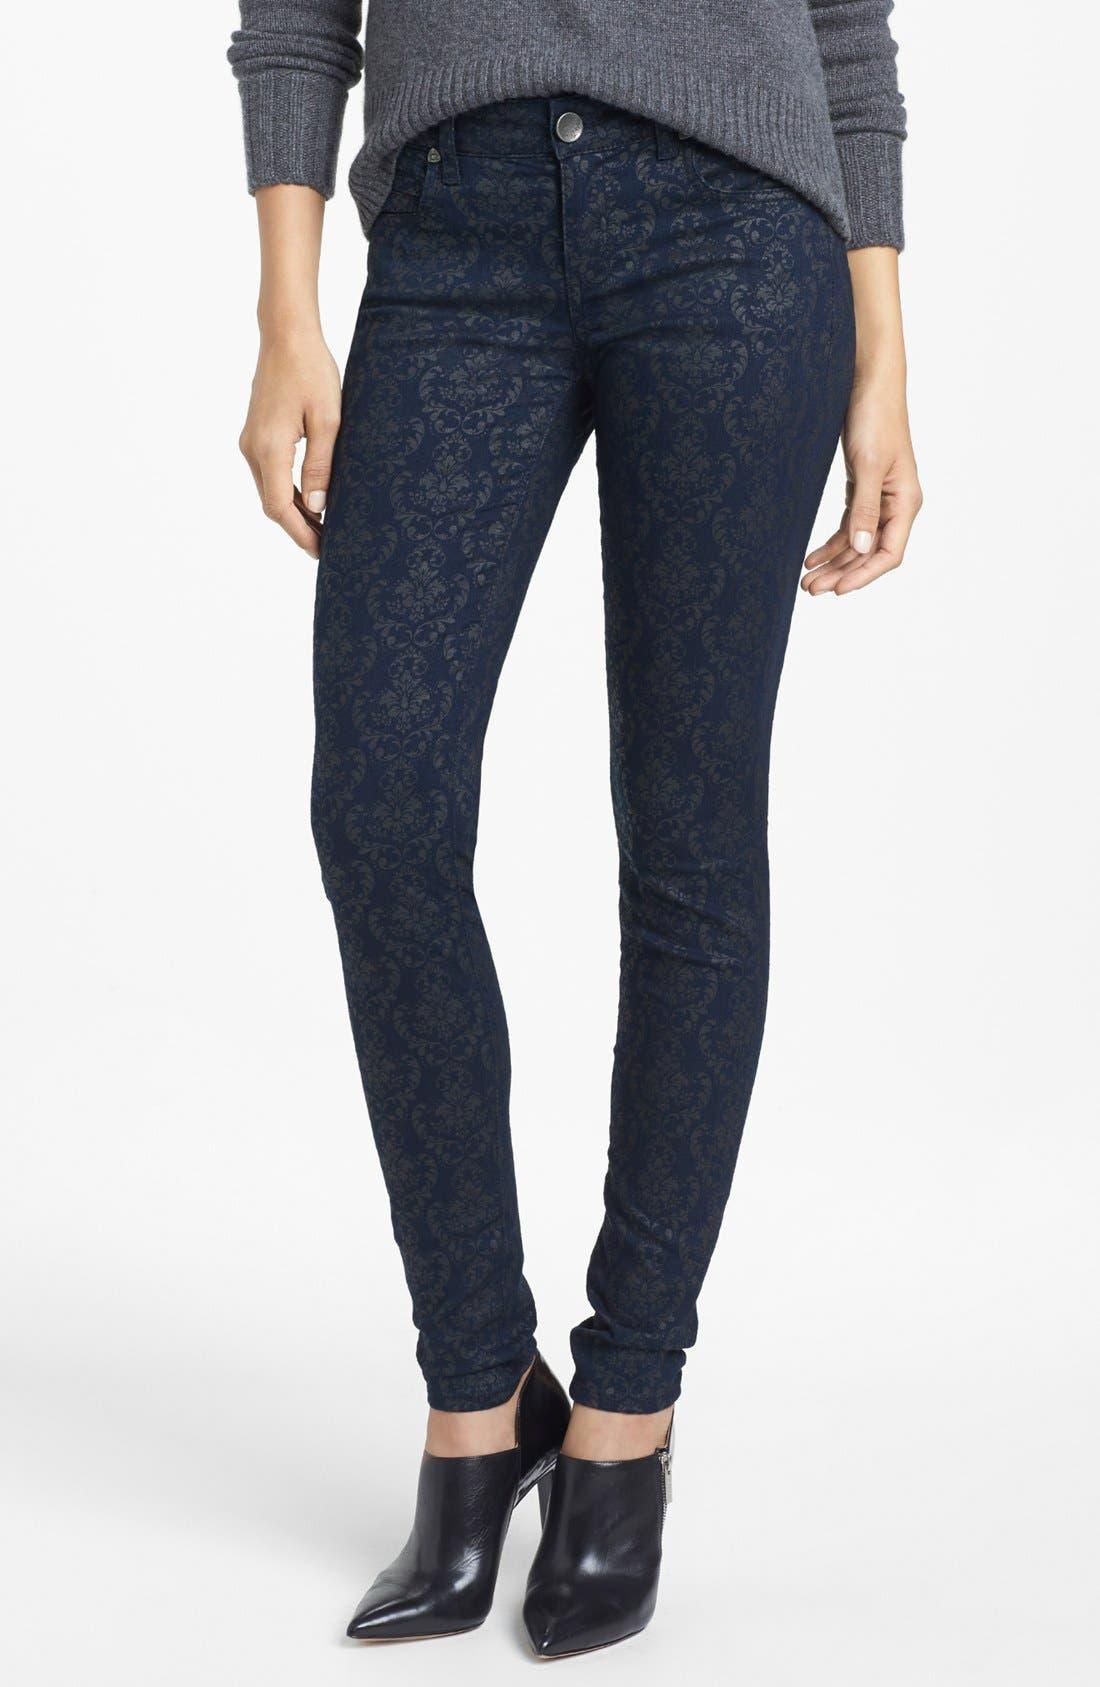 Alternate Image 1 Selected - KUT from the Kloth 'Mia' Print Skinny Jeans (Indigo)